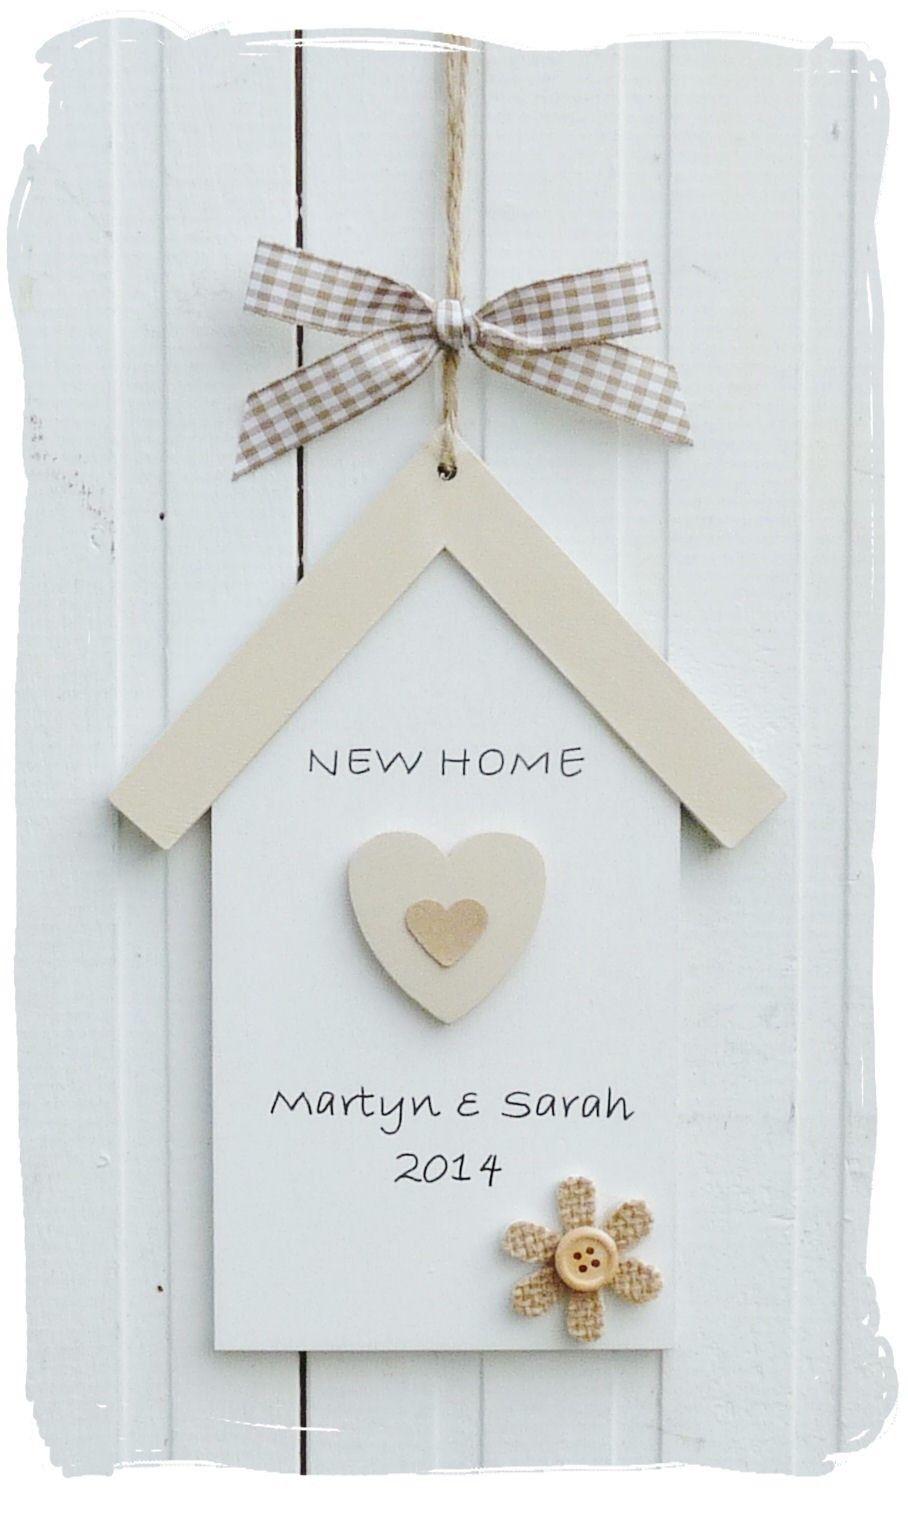 New Home Gift : www.bynicki.co.uk